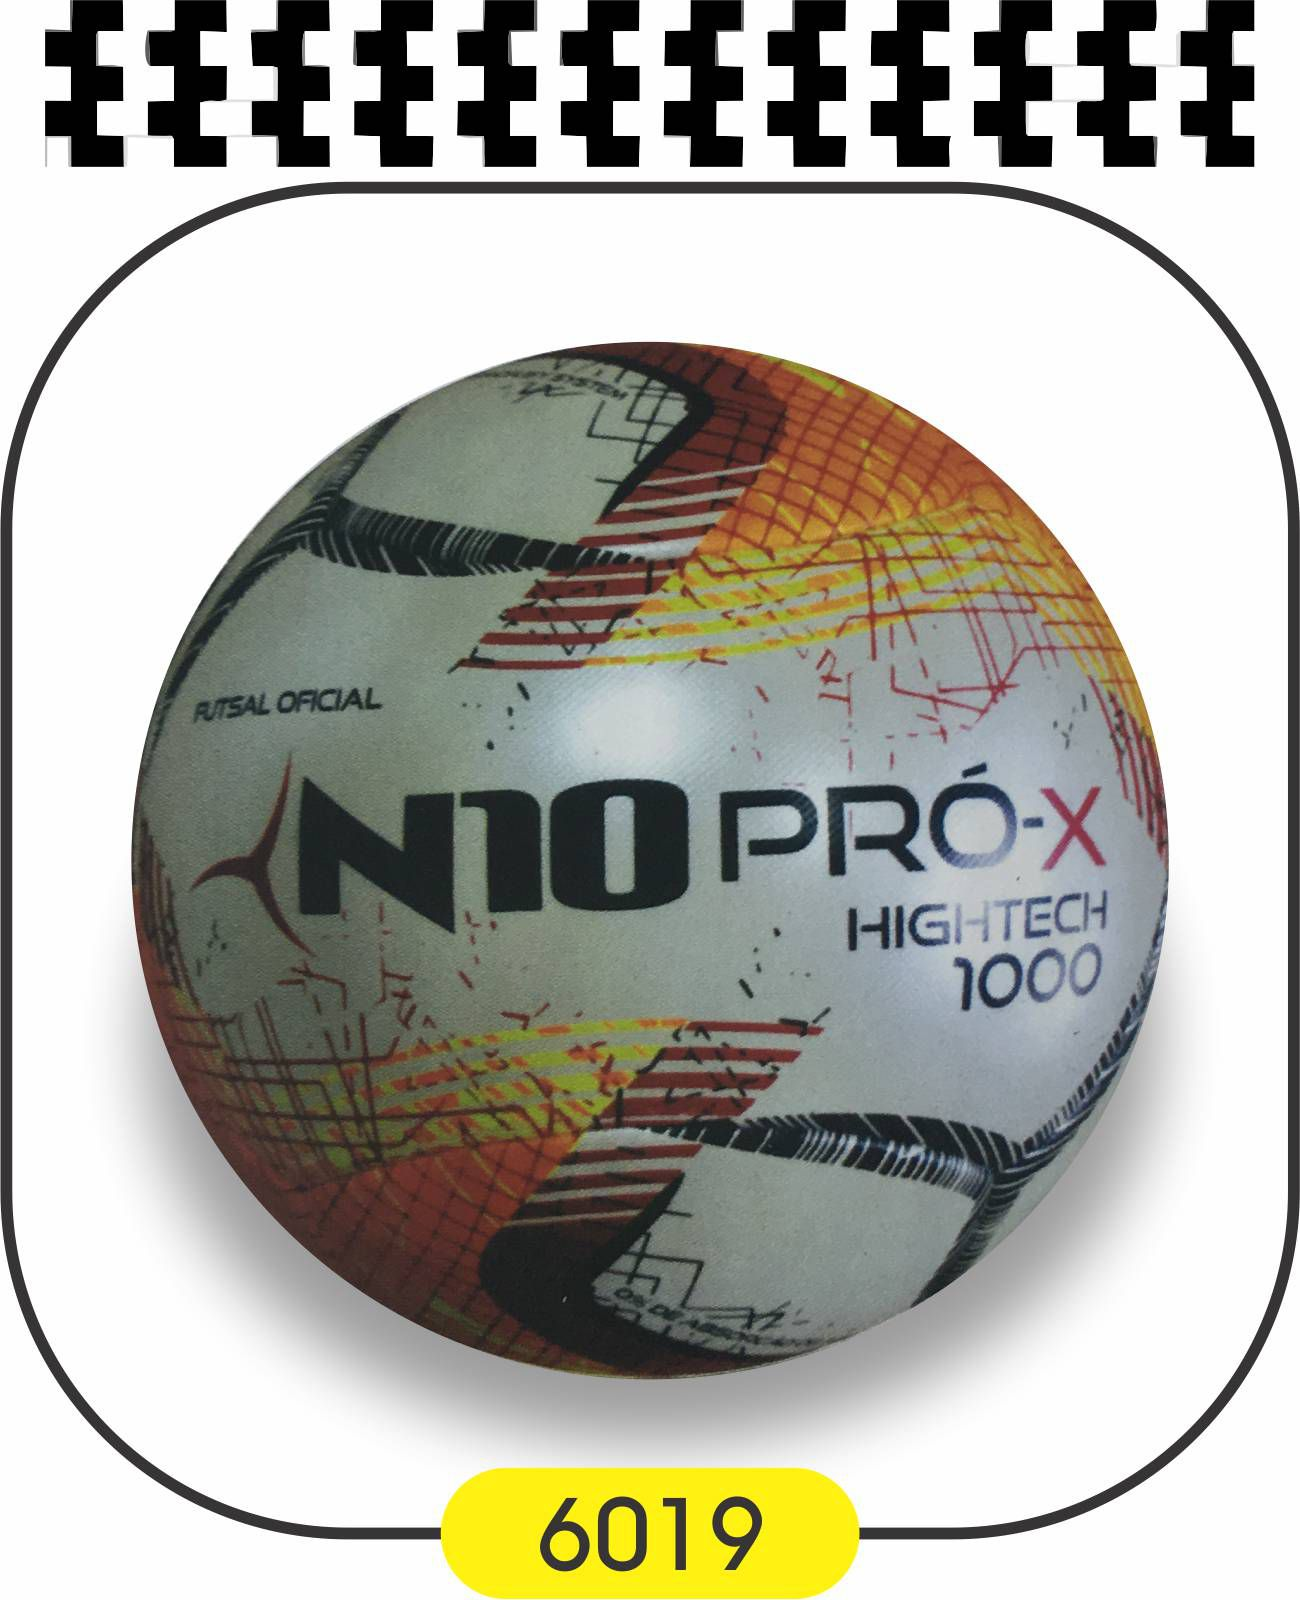 Bolas de Futebol - voleibol - Futsal - Mix 3 Un.  - Bolas Lassabia - Bolas e Brindes Personalizados